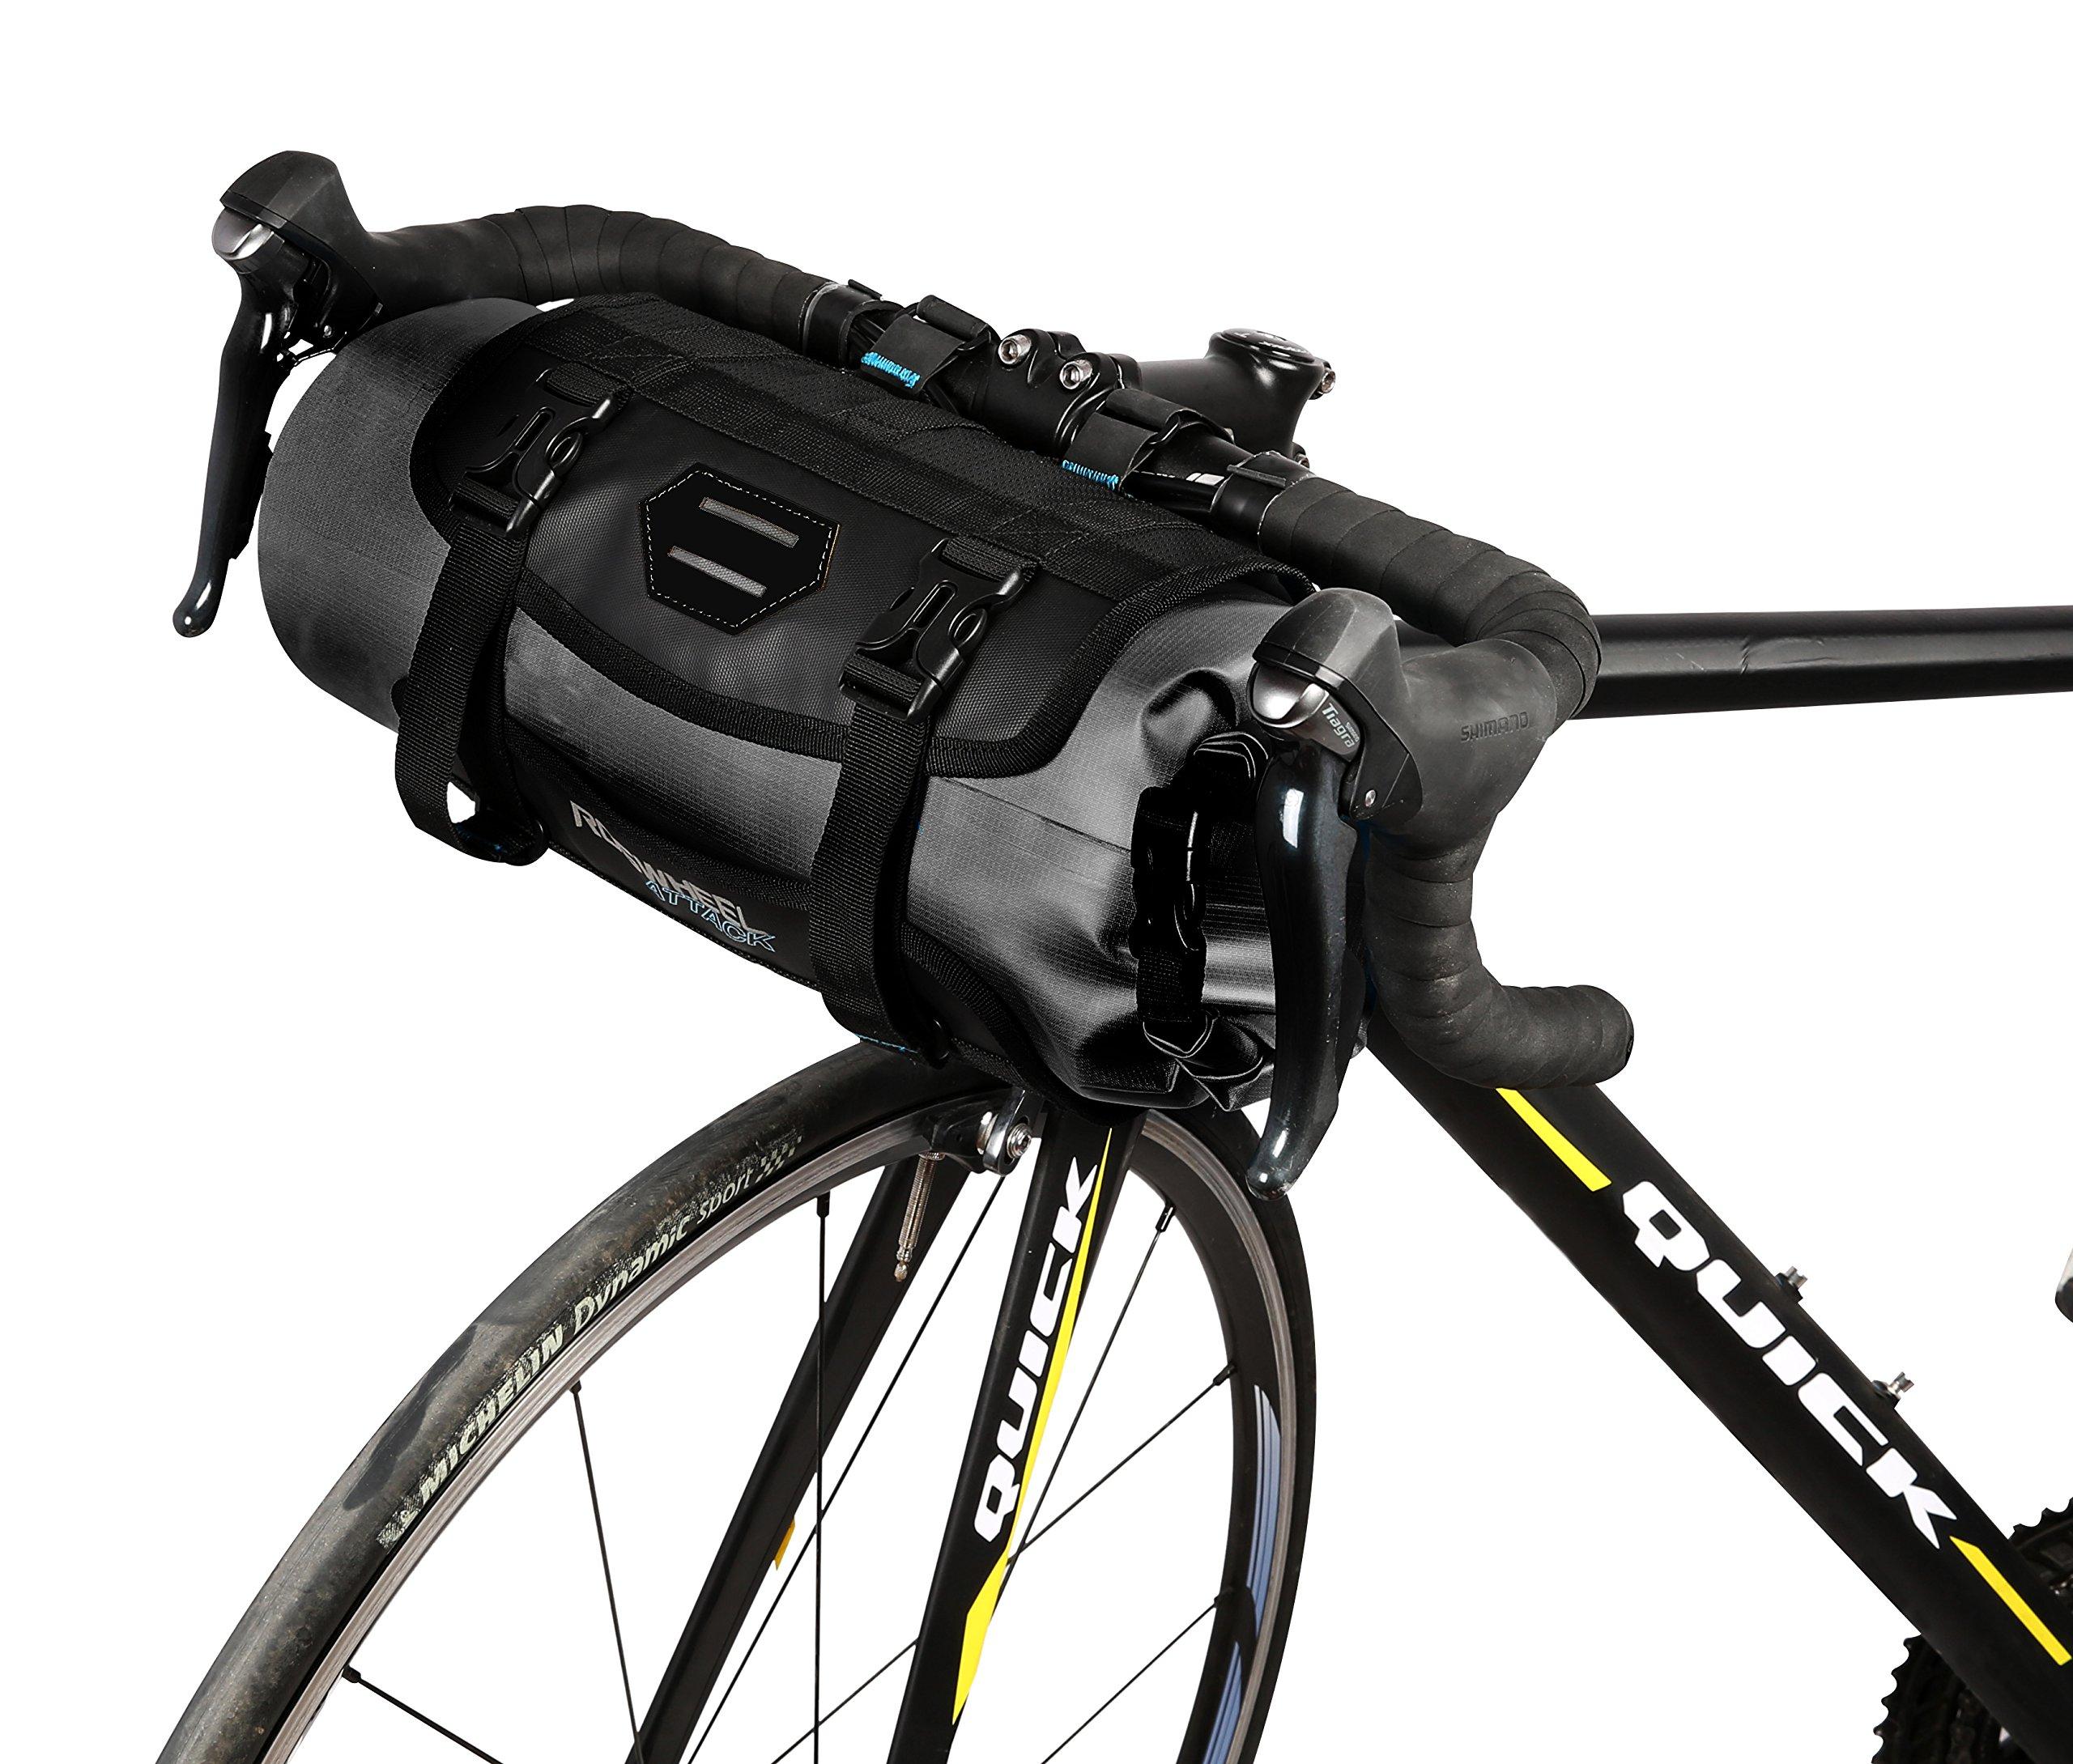 Roswheel Attack Series 111369 Waterproof Adjustable Capacity Bike Bicycle Cycling Handlebar Bag Detachable Dry Pack, Black